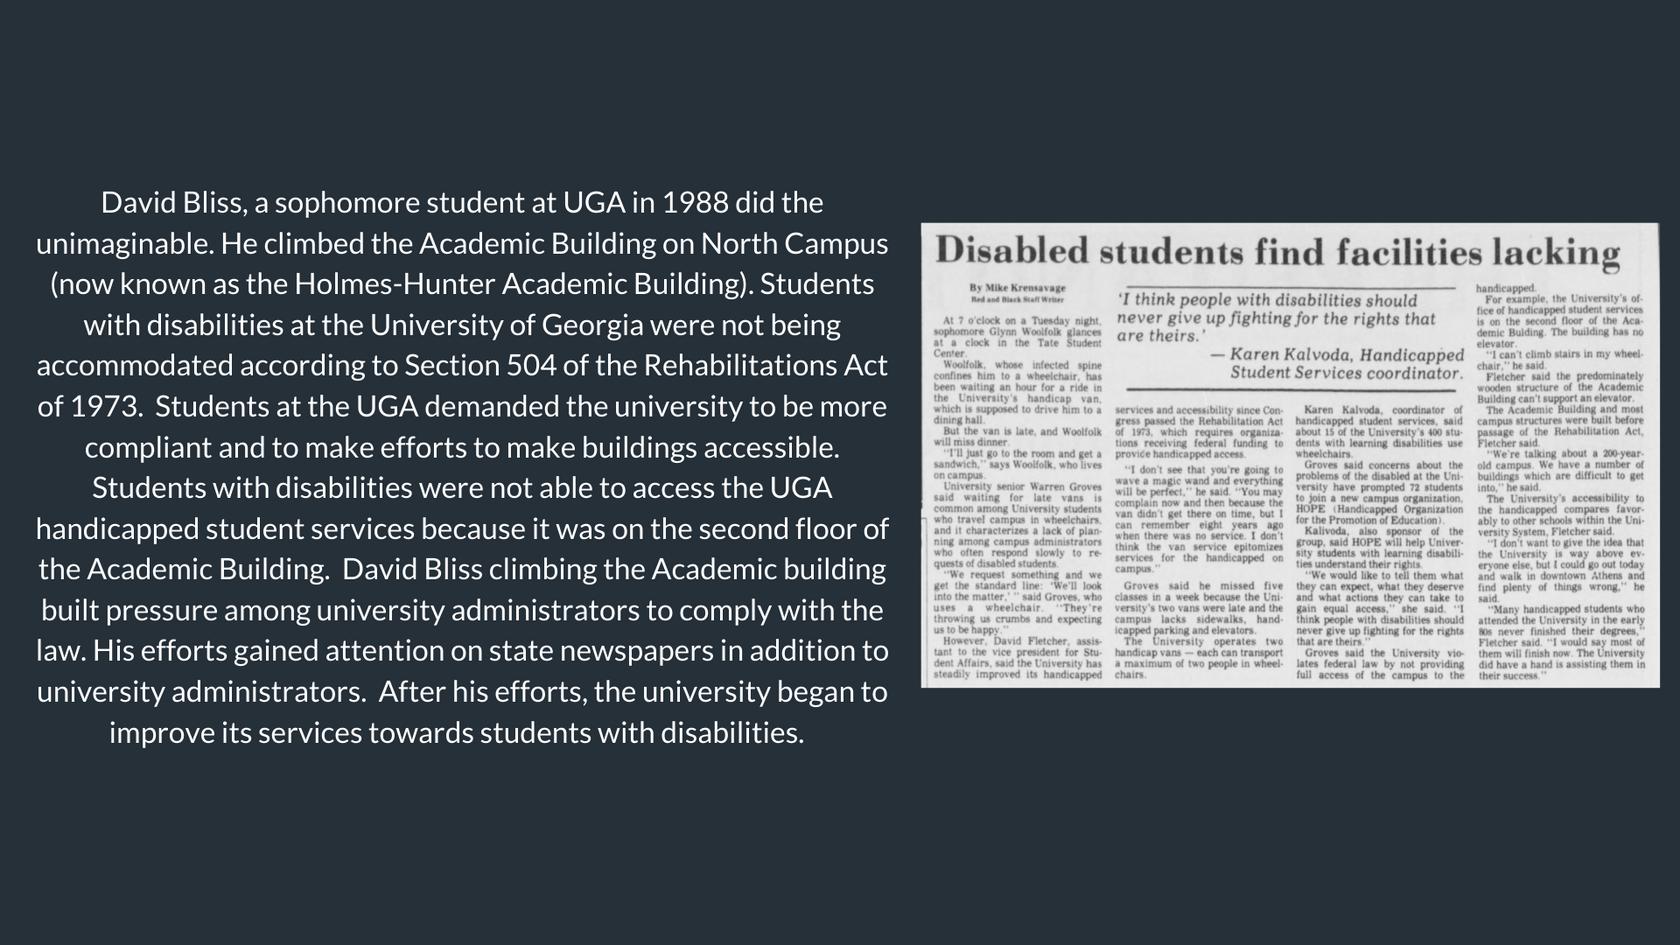 Disability Movement at UGA con't